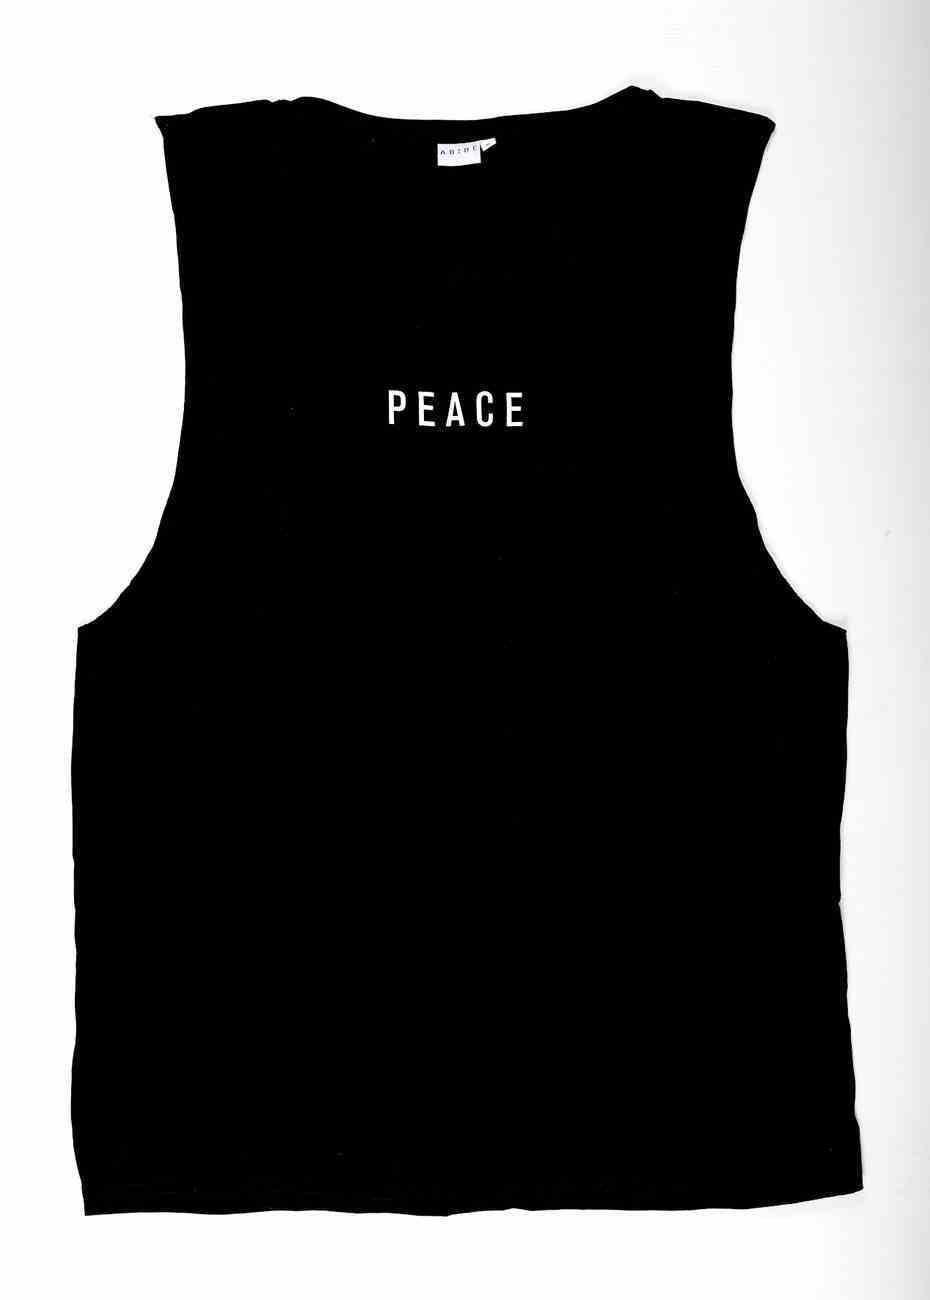 Mens Barnard Tank: Peace, Small, Black With White Print (Abide T-shirt Apparel Series) Soft Goods